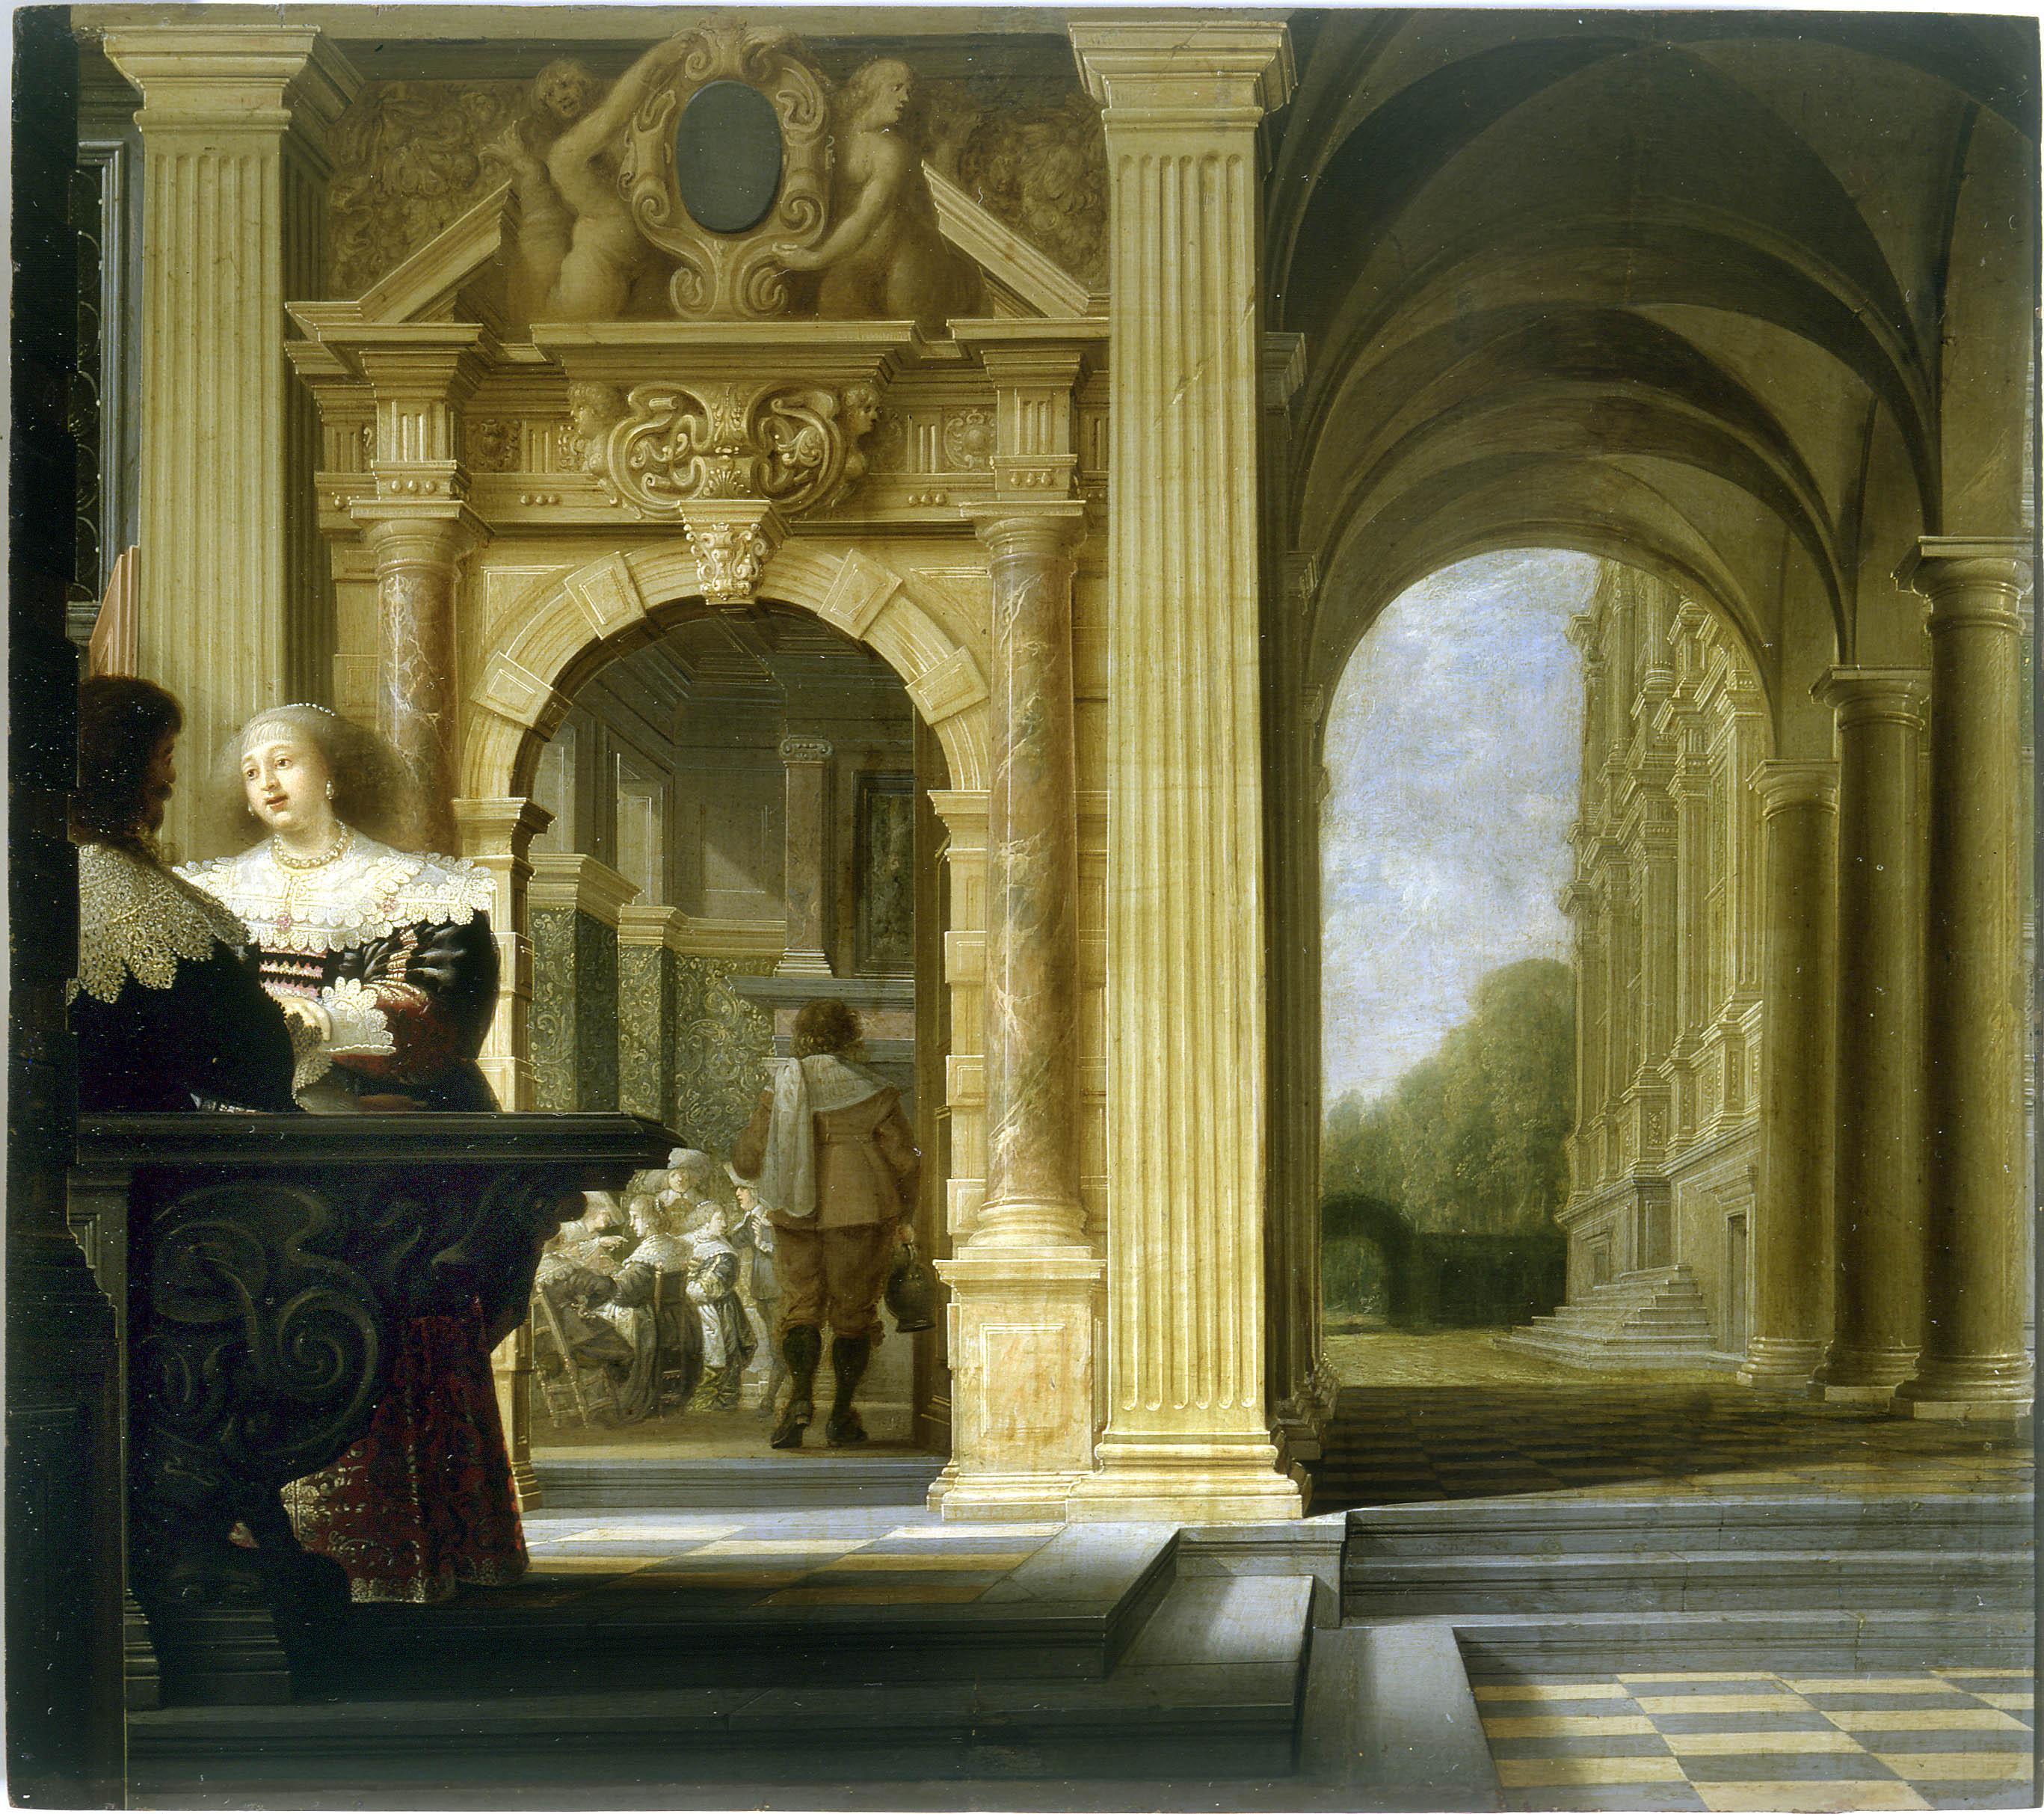 Dirck van Delen - Scène galante dans un palais